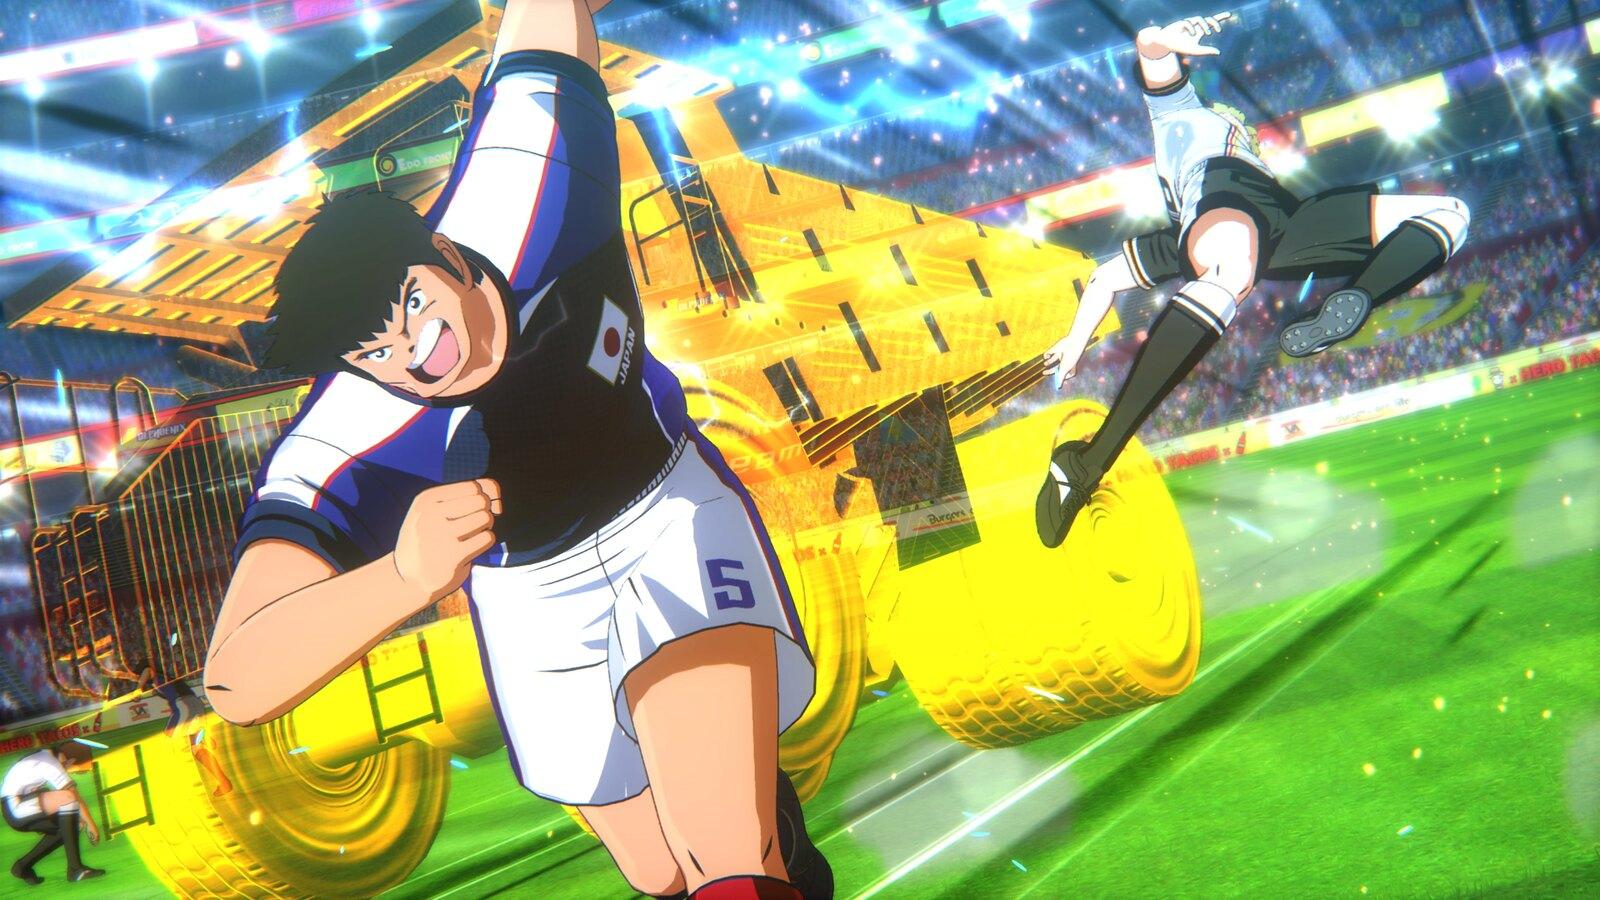 49434890372 5e770a37a0 h - Captain Tsubasa: Rise of new Champions bringt Arcade-Action ins Wohnzimmer